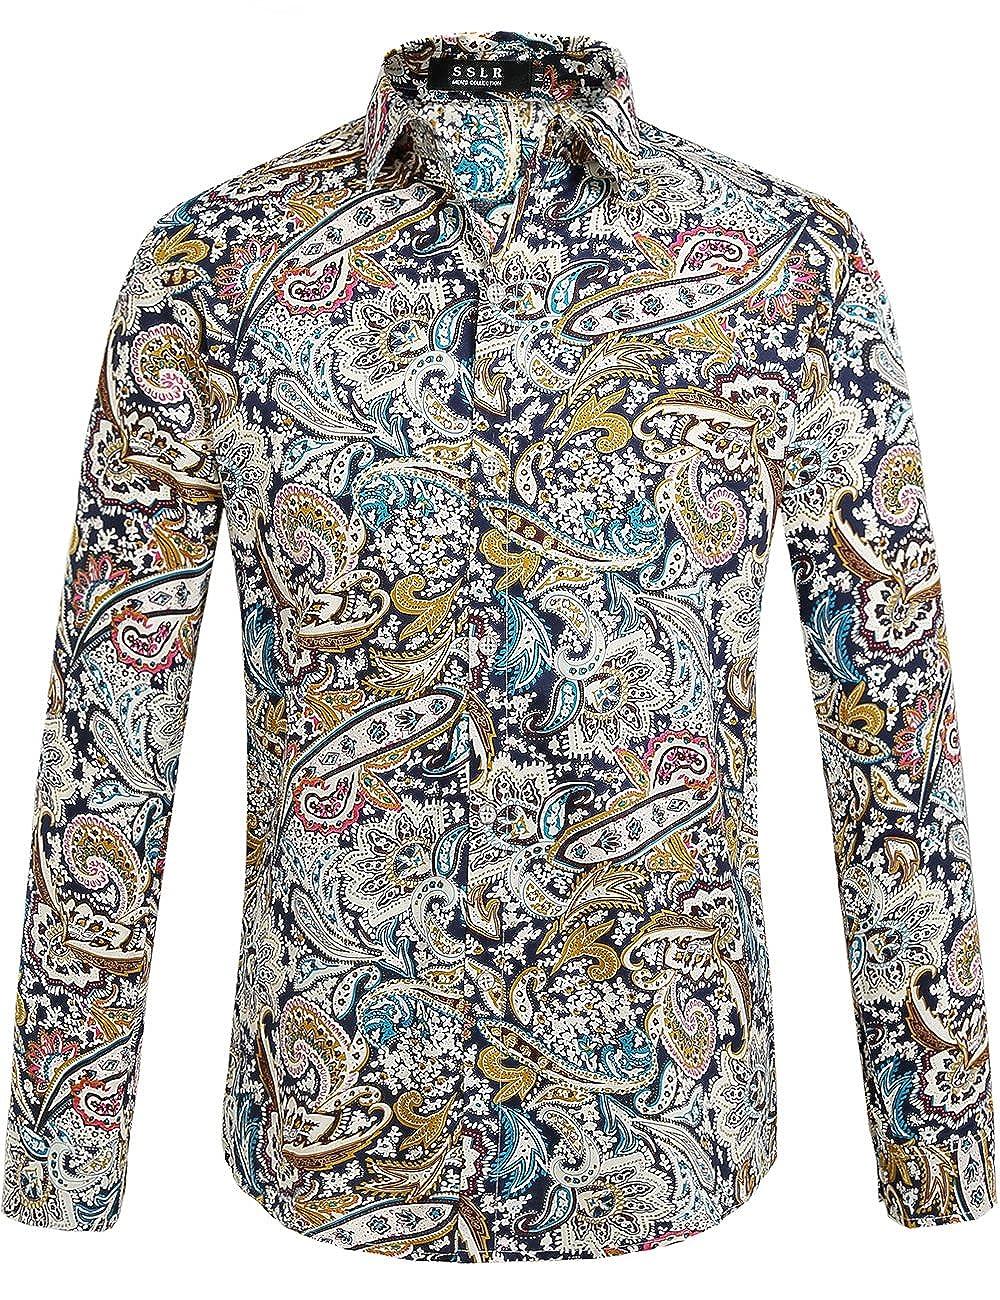 1960s Men's Clothing, 70s Men's Fashion SSLR Mens Paisley Cotton Casual Button Down Long Sleeve Shirt £26.42 AT vintagedancer.com